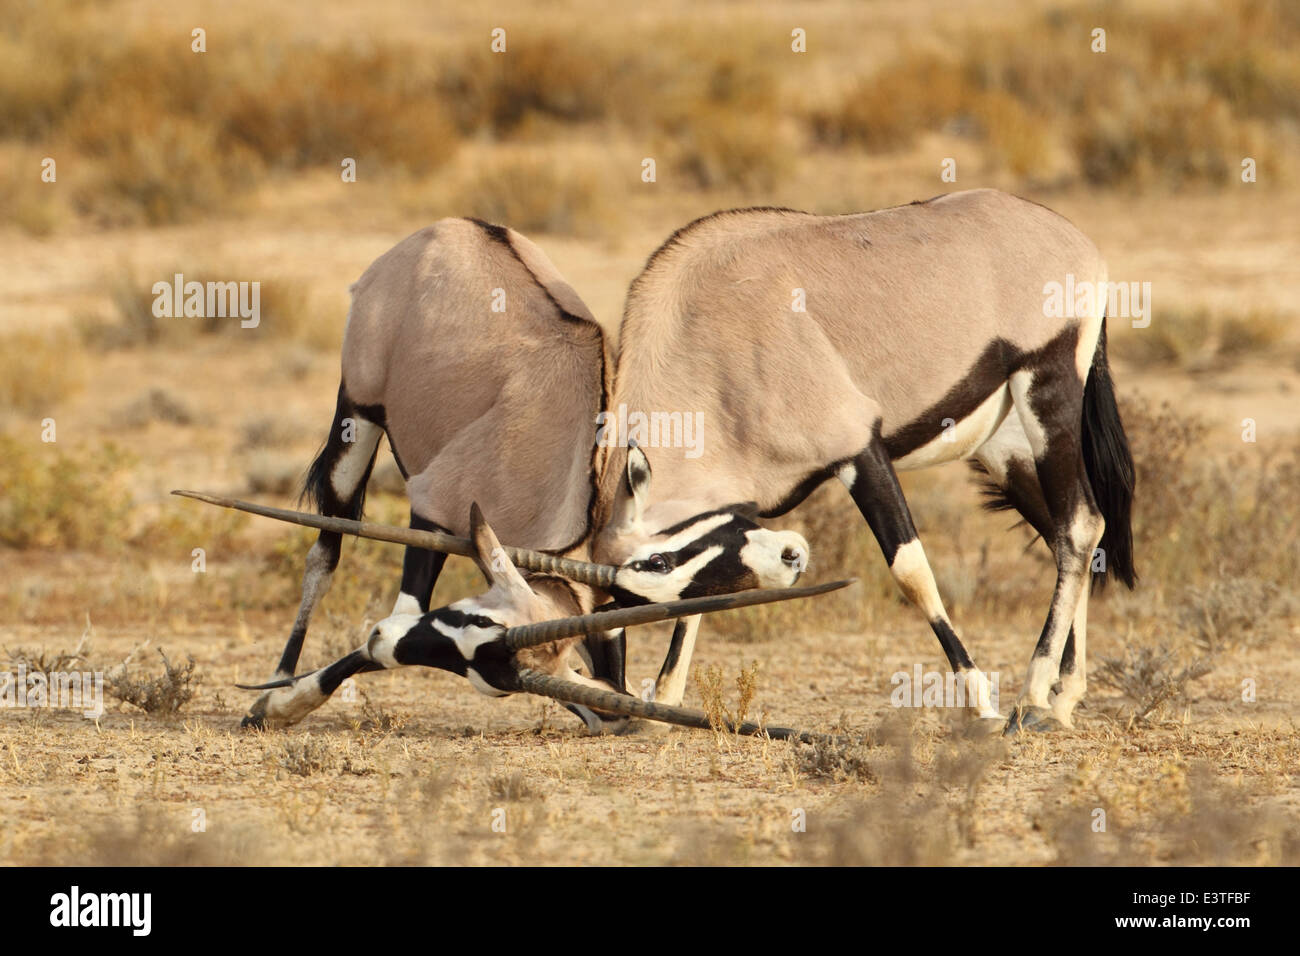 A pair of gemsbok lock horns during mating season inside the Kgalagadi Transfrontier National Park. - Stock Image